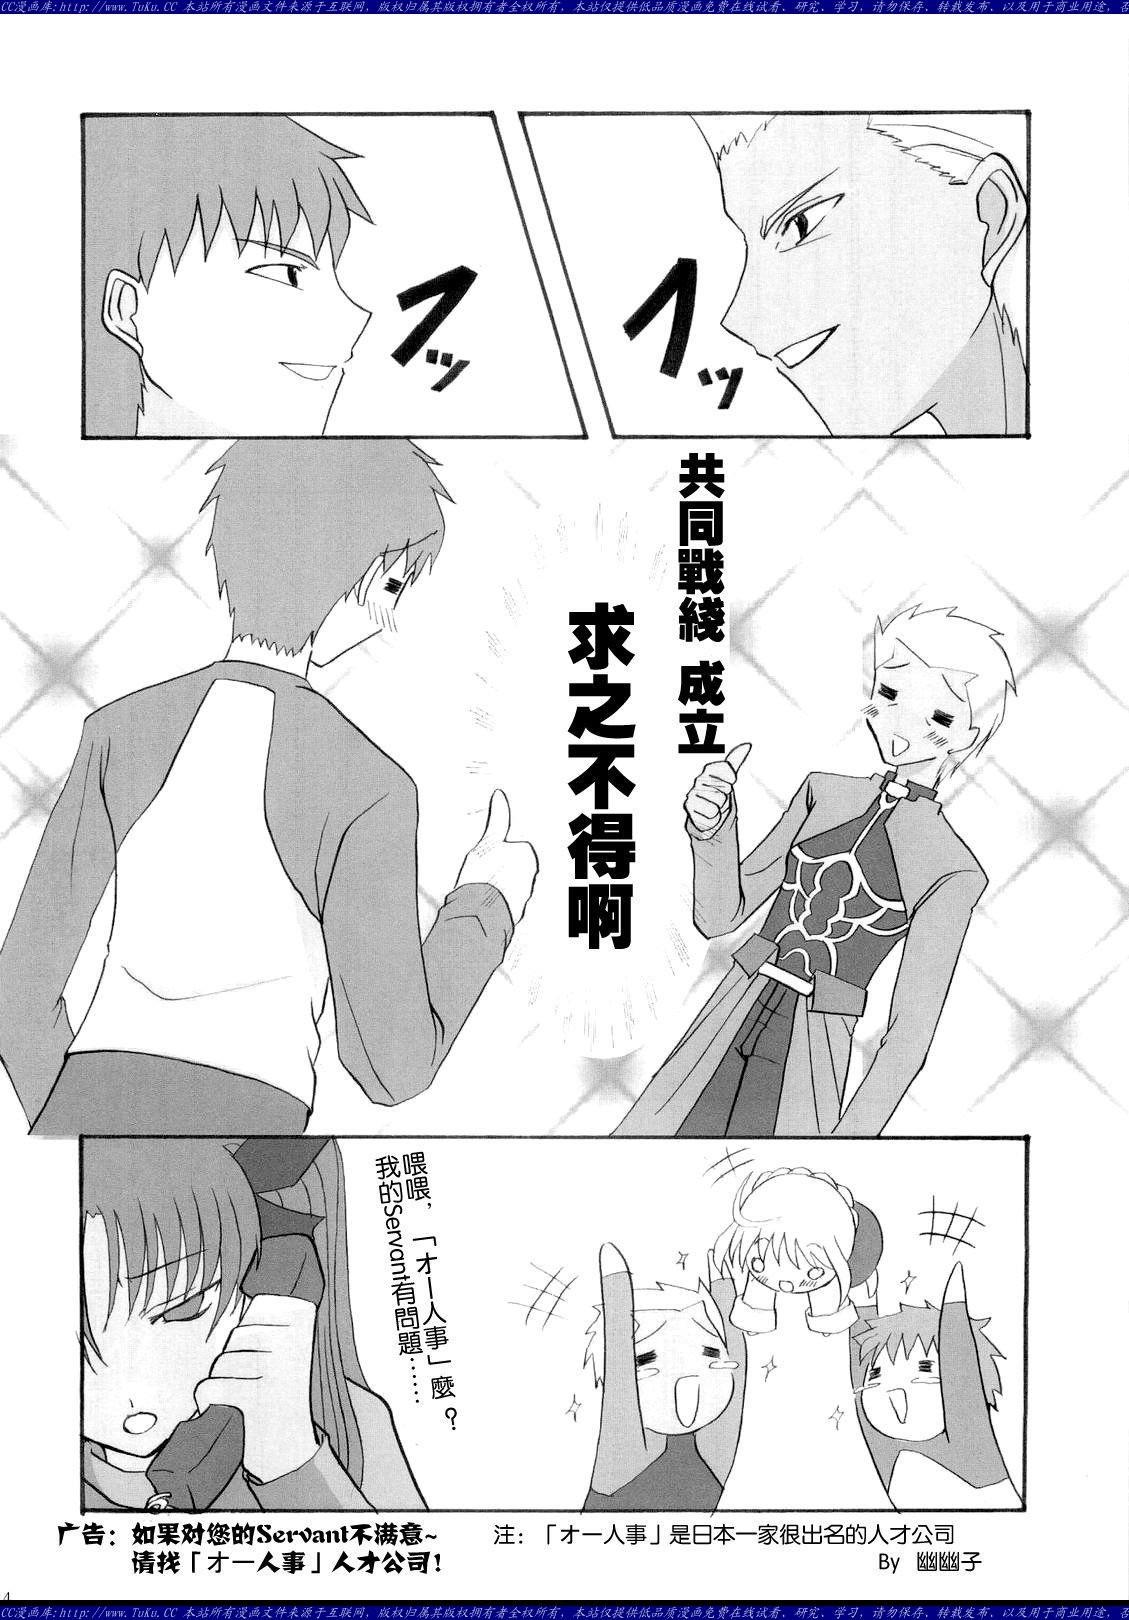 Fate漫画同人saber变小了(2)银魂漫画578图片